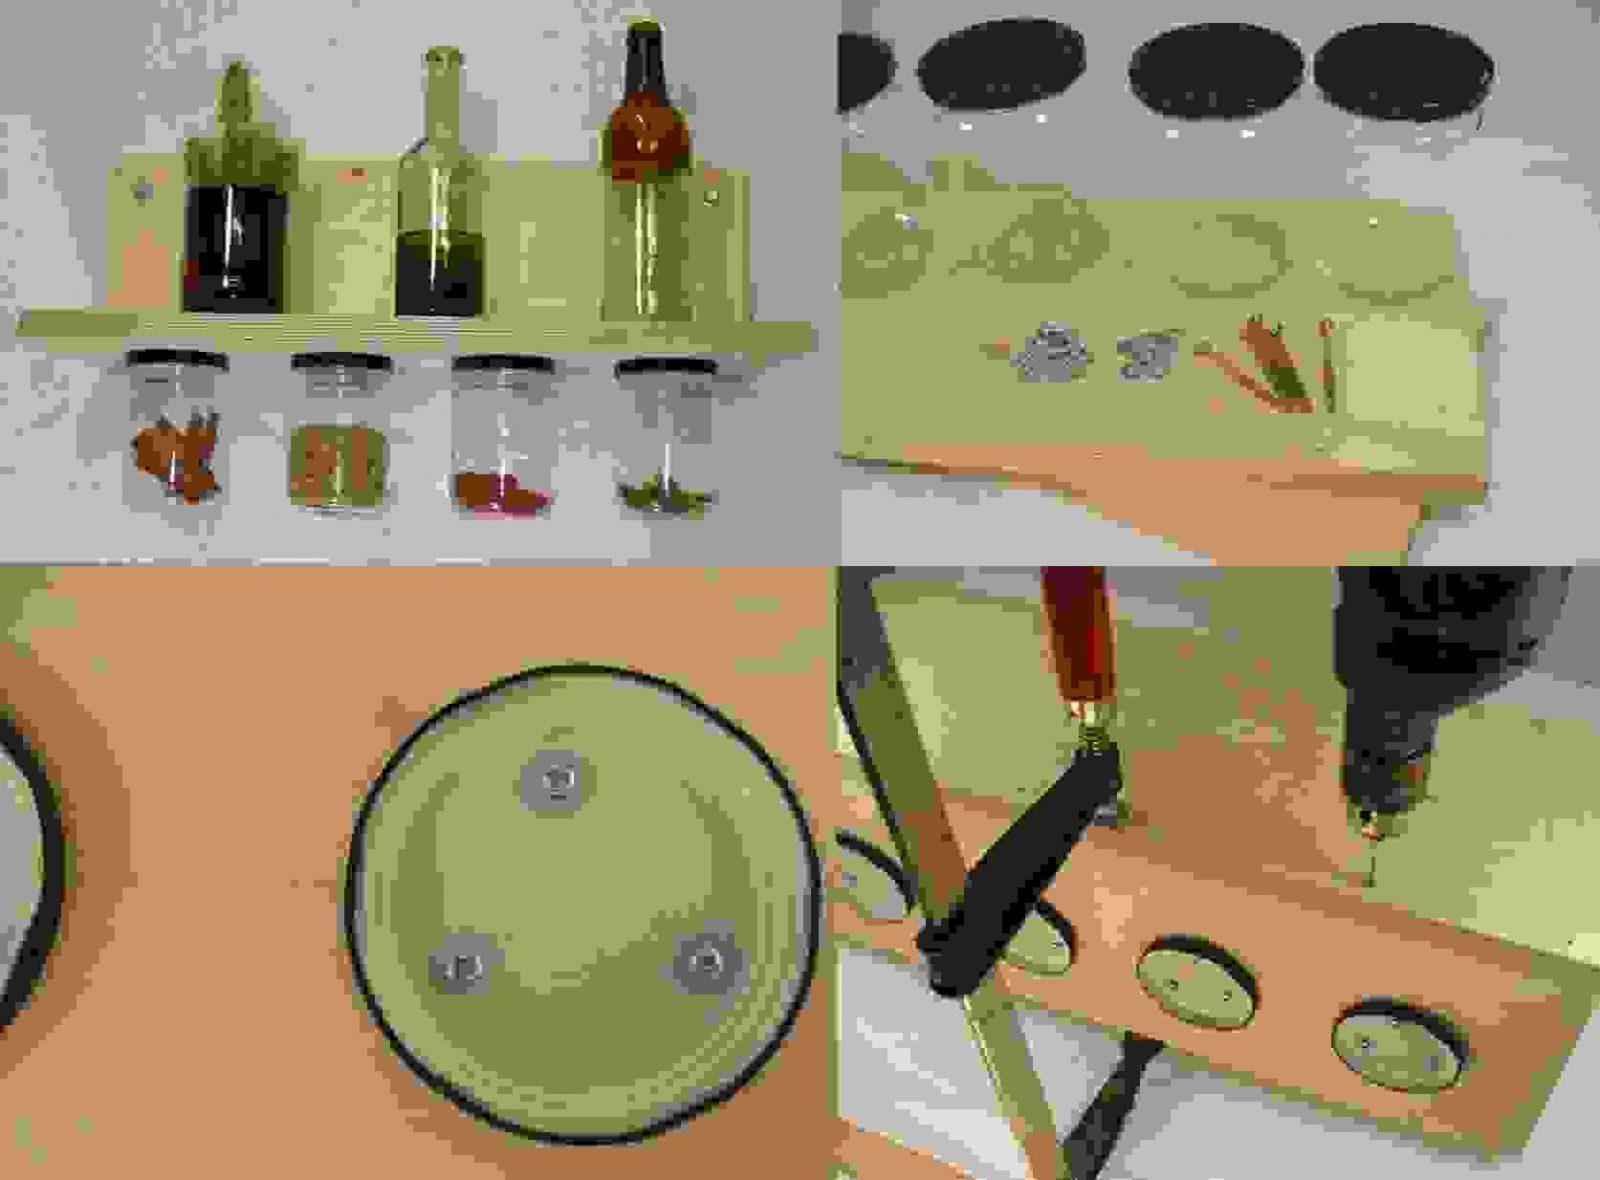 Upcycling Ideen Zum Nachmachen Kreative Full Size Of Upcycling von Upcycling Ideen Zum Selbermachen Bild